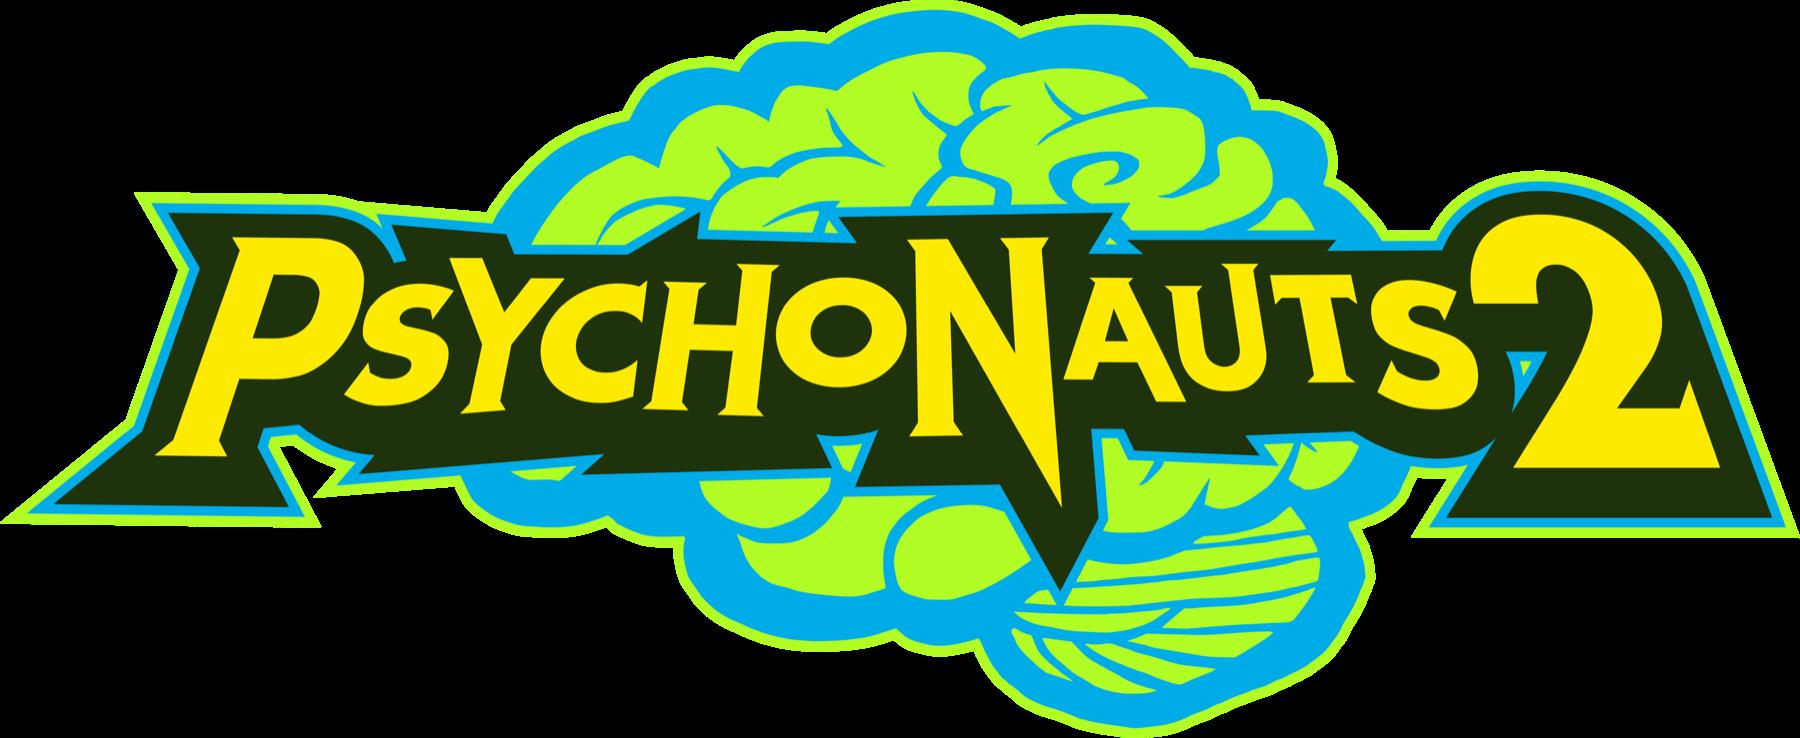 0_1632133561682_Psychonauts-2-Logo-Color.png